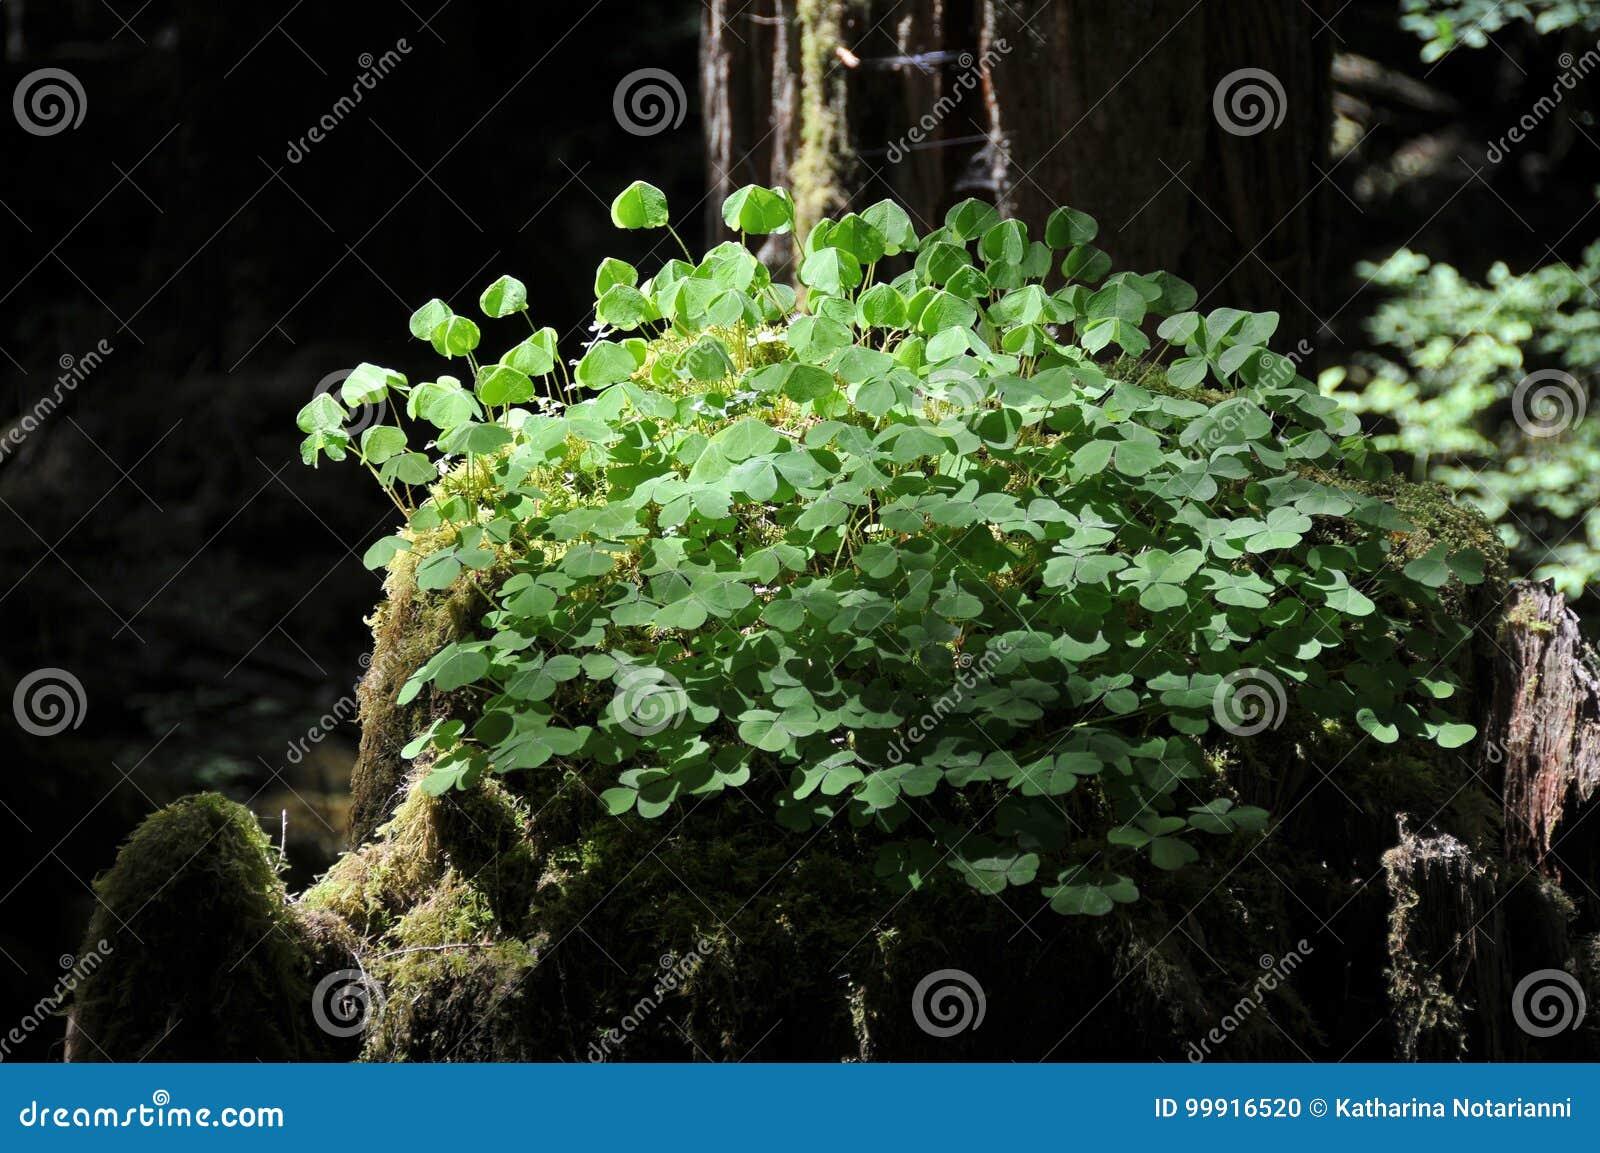 Wood Sorrel Oxalis Oregana Growing On Old Growth Tree Stump In